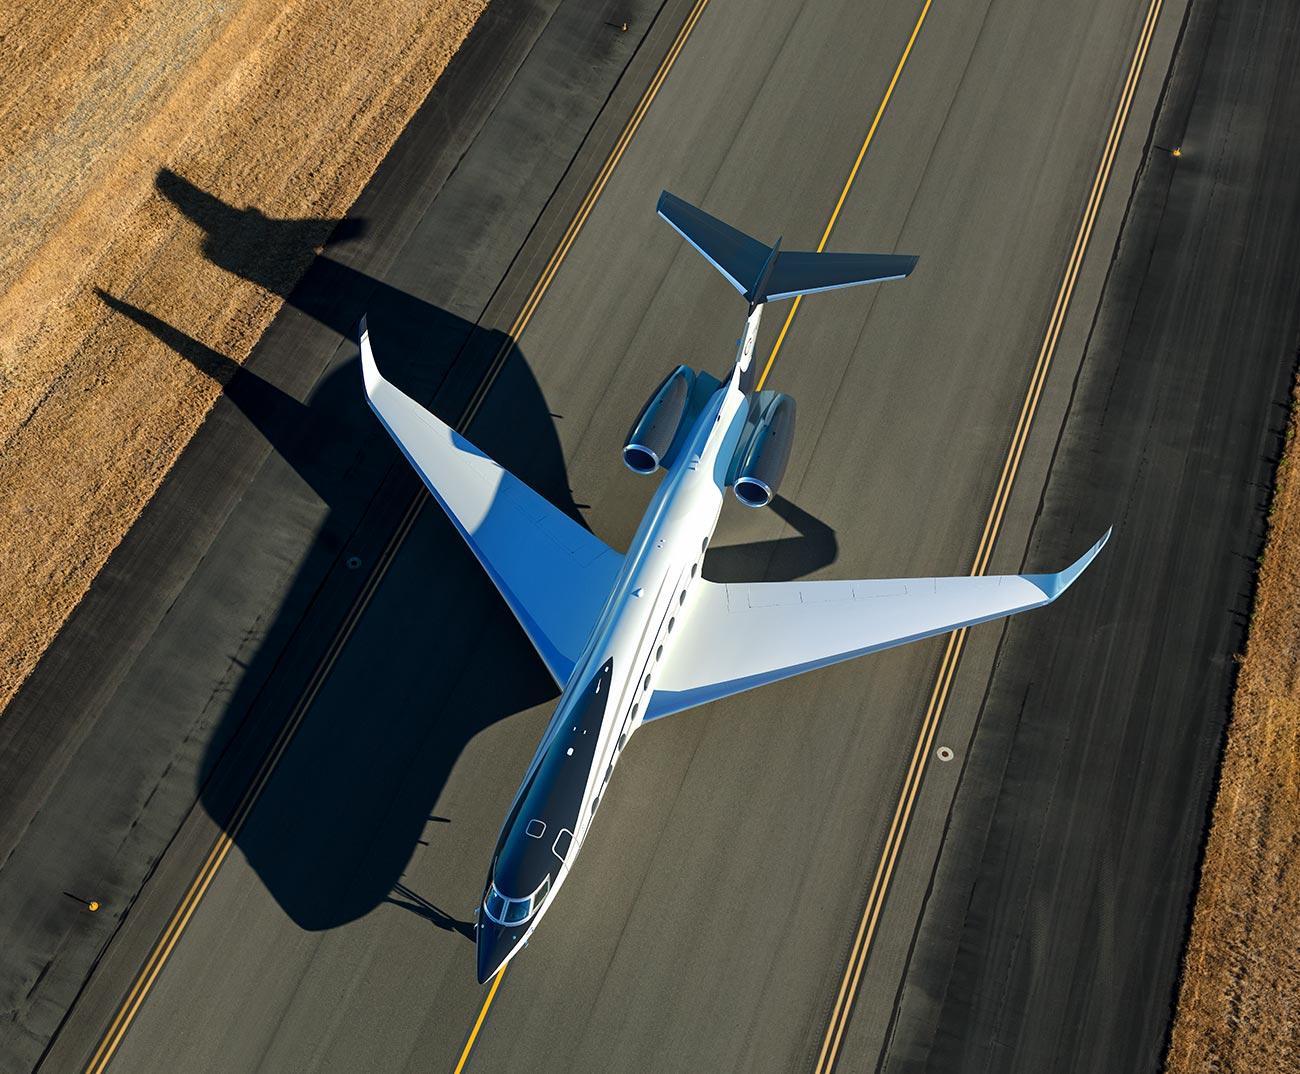 Gulfstream G700 Take-off